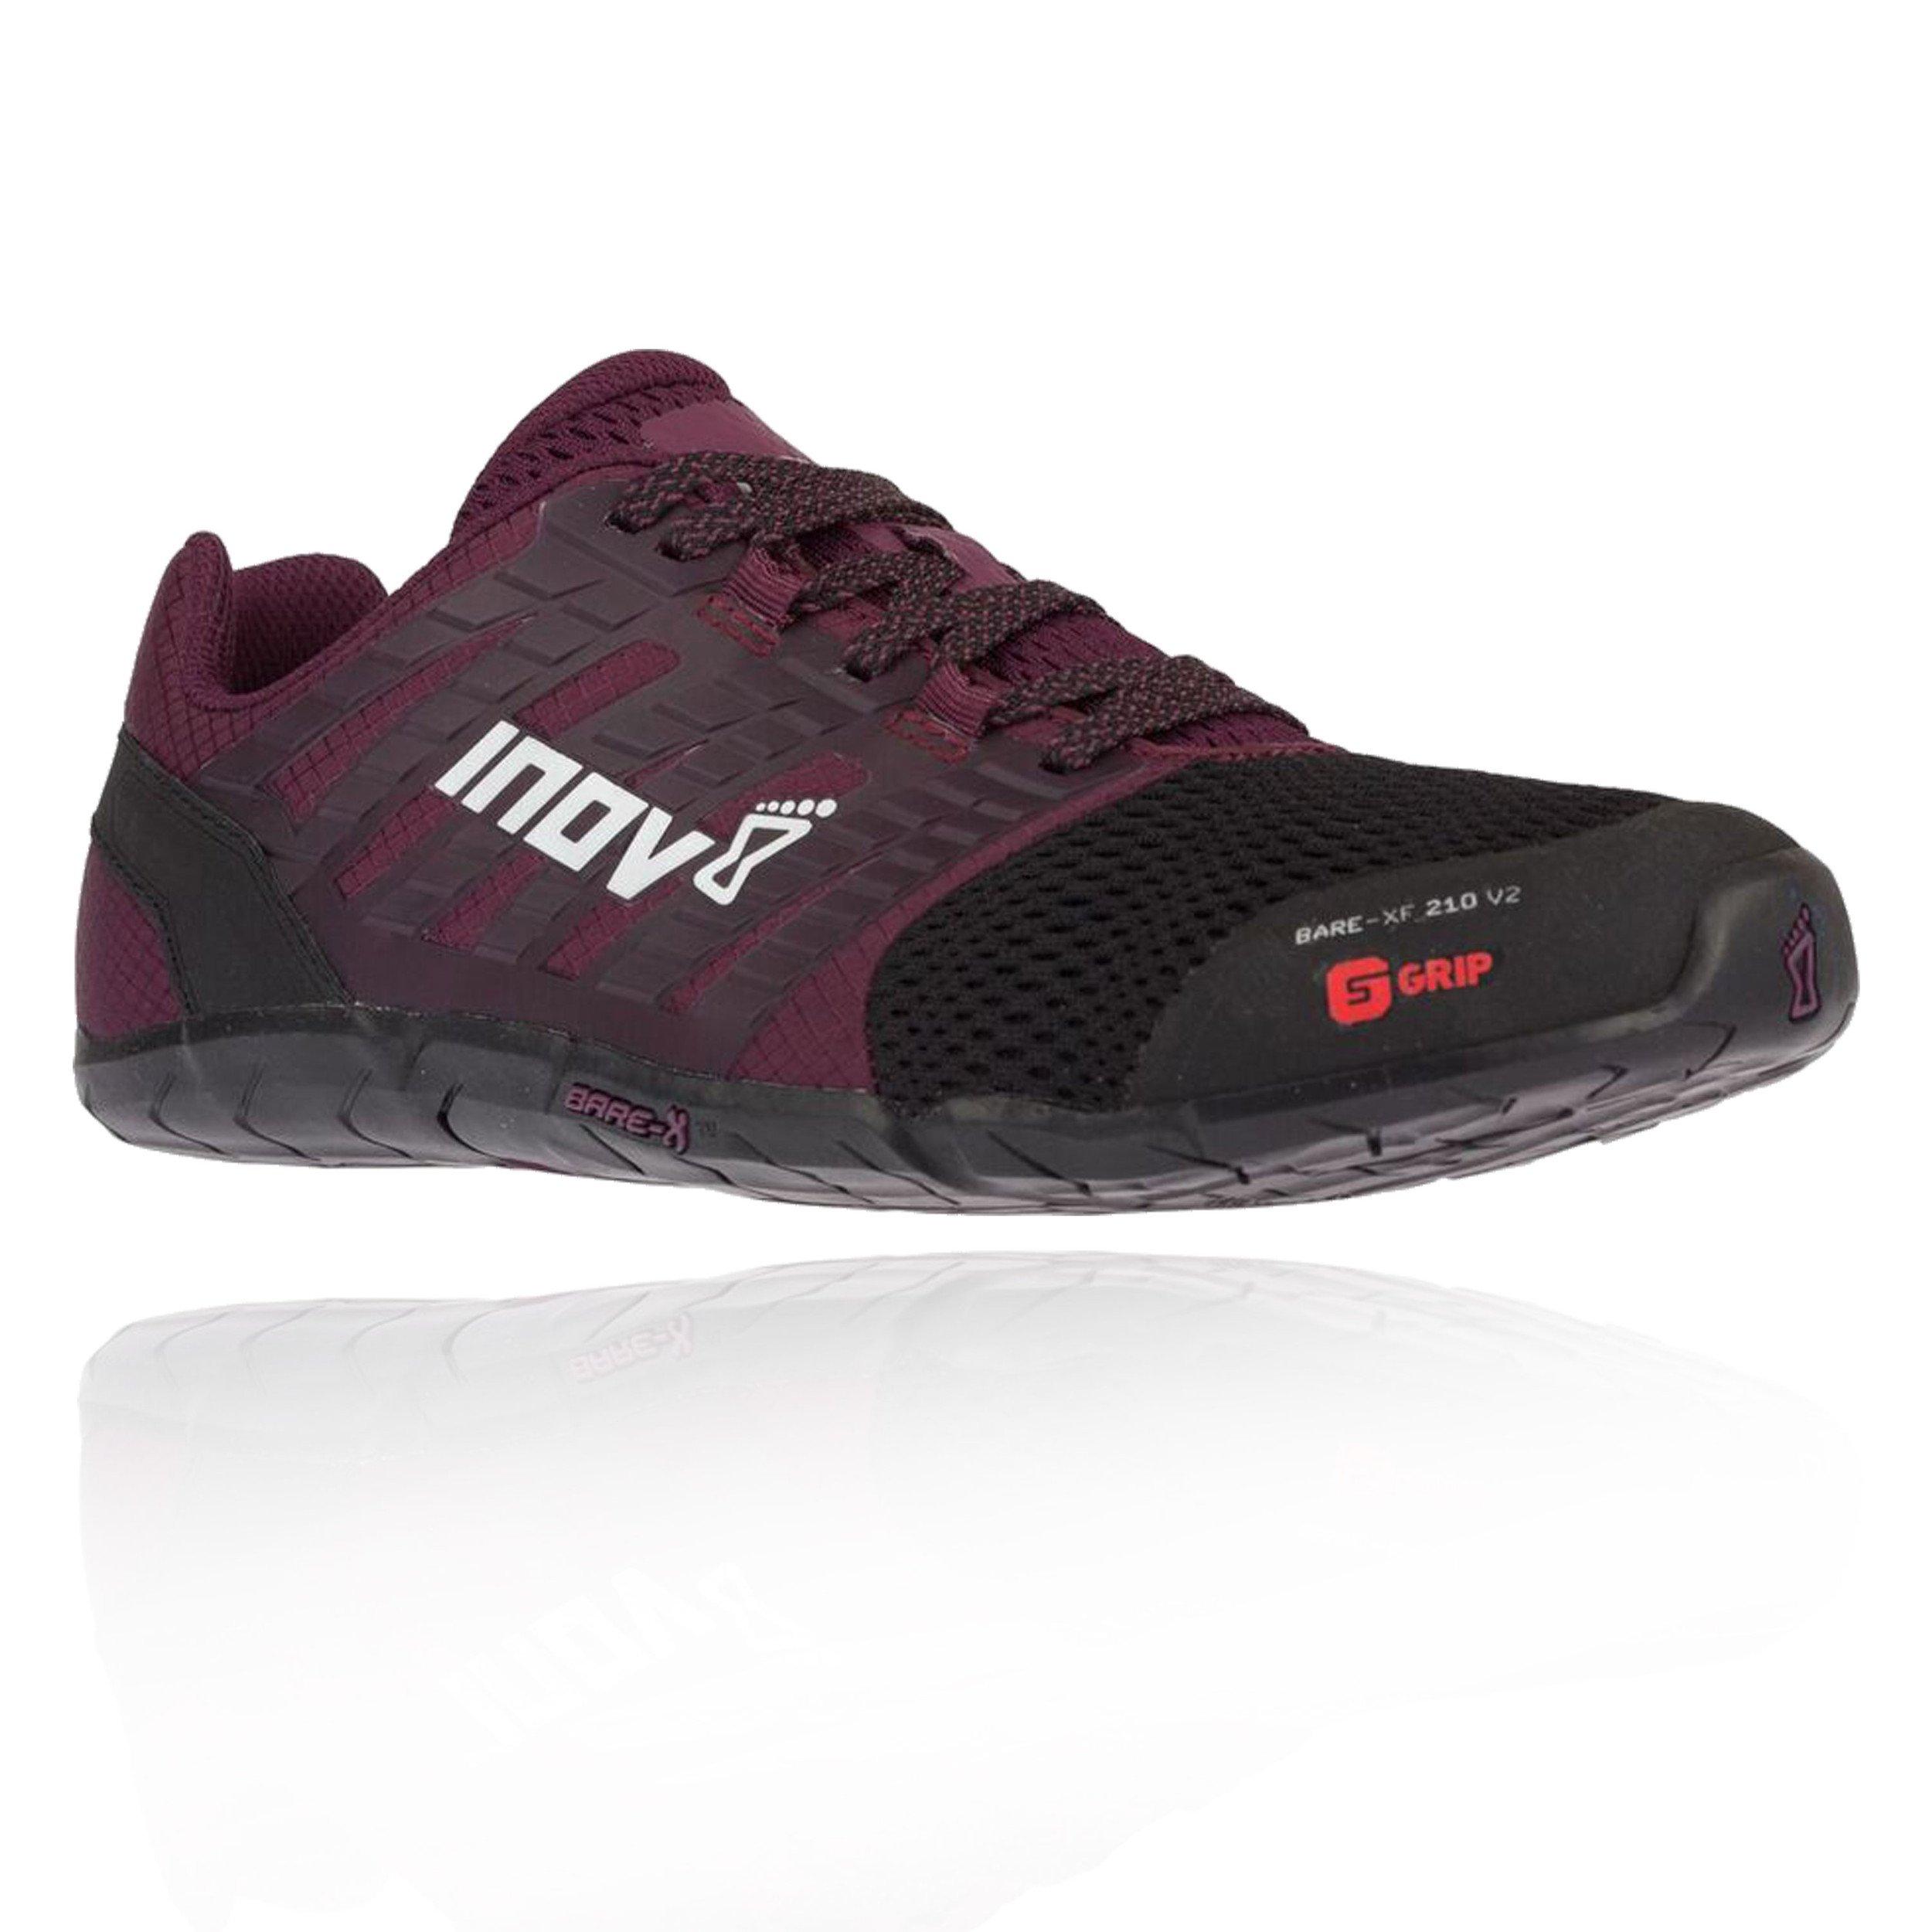 Inov-8 Womens Bare-XF 210 V2 - Barefoot Minimalist Cross Training Shoes - Zero Drop - Wide Toe Box - Versatile Shoe for Powerlifting & Gym - Calisthenics & Martial Arts - Black/Purple 8.5 W US by Inov-8